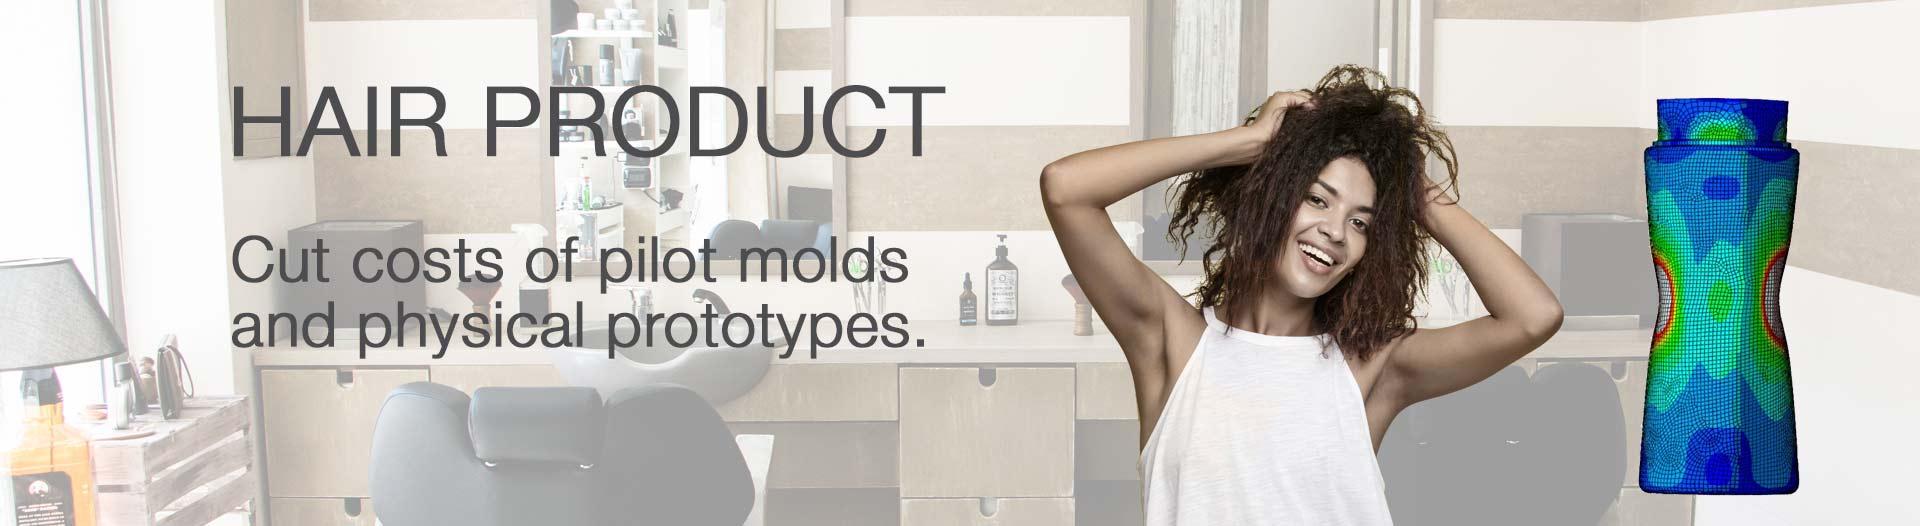 hair product packaging